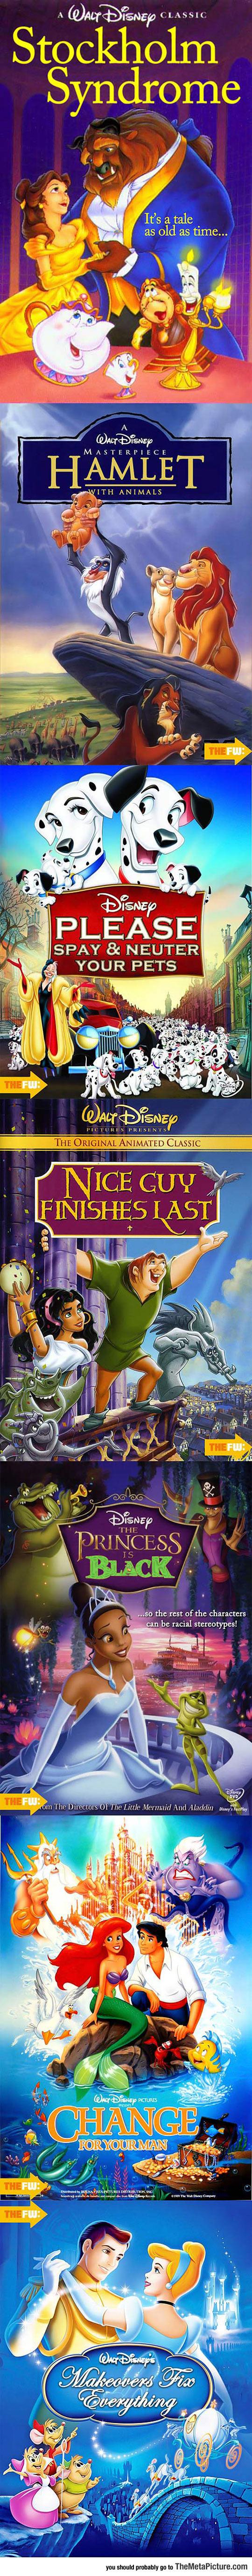 Alternate Disney Film Titles That Work Better